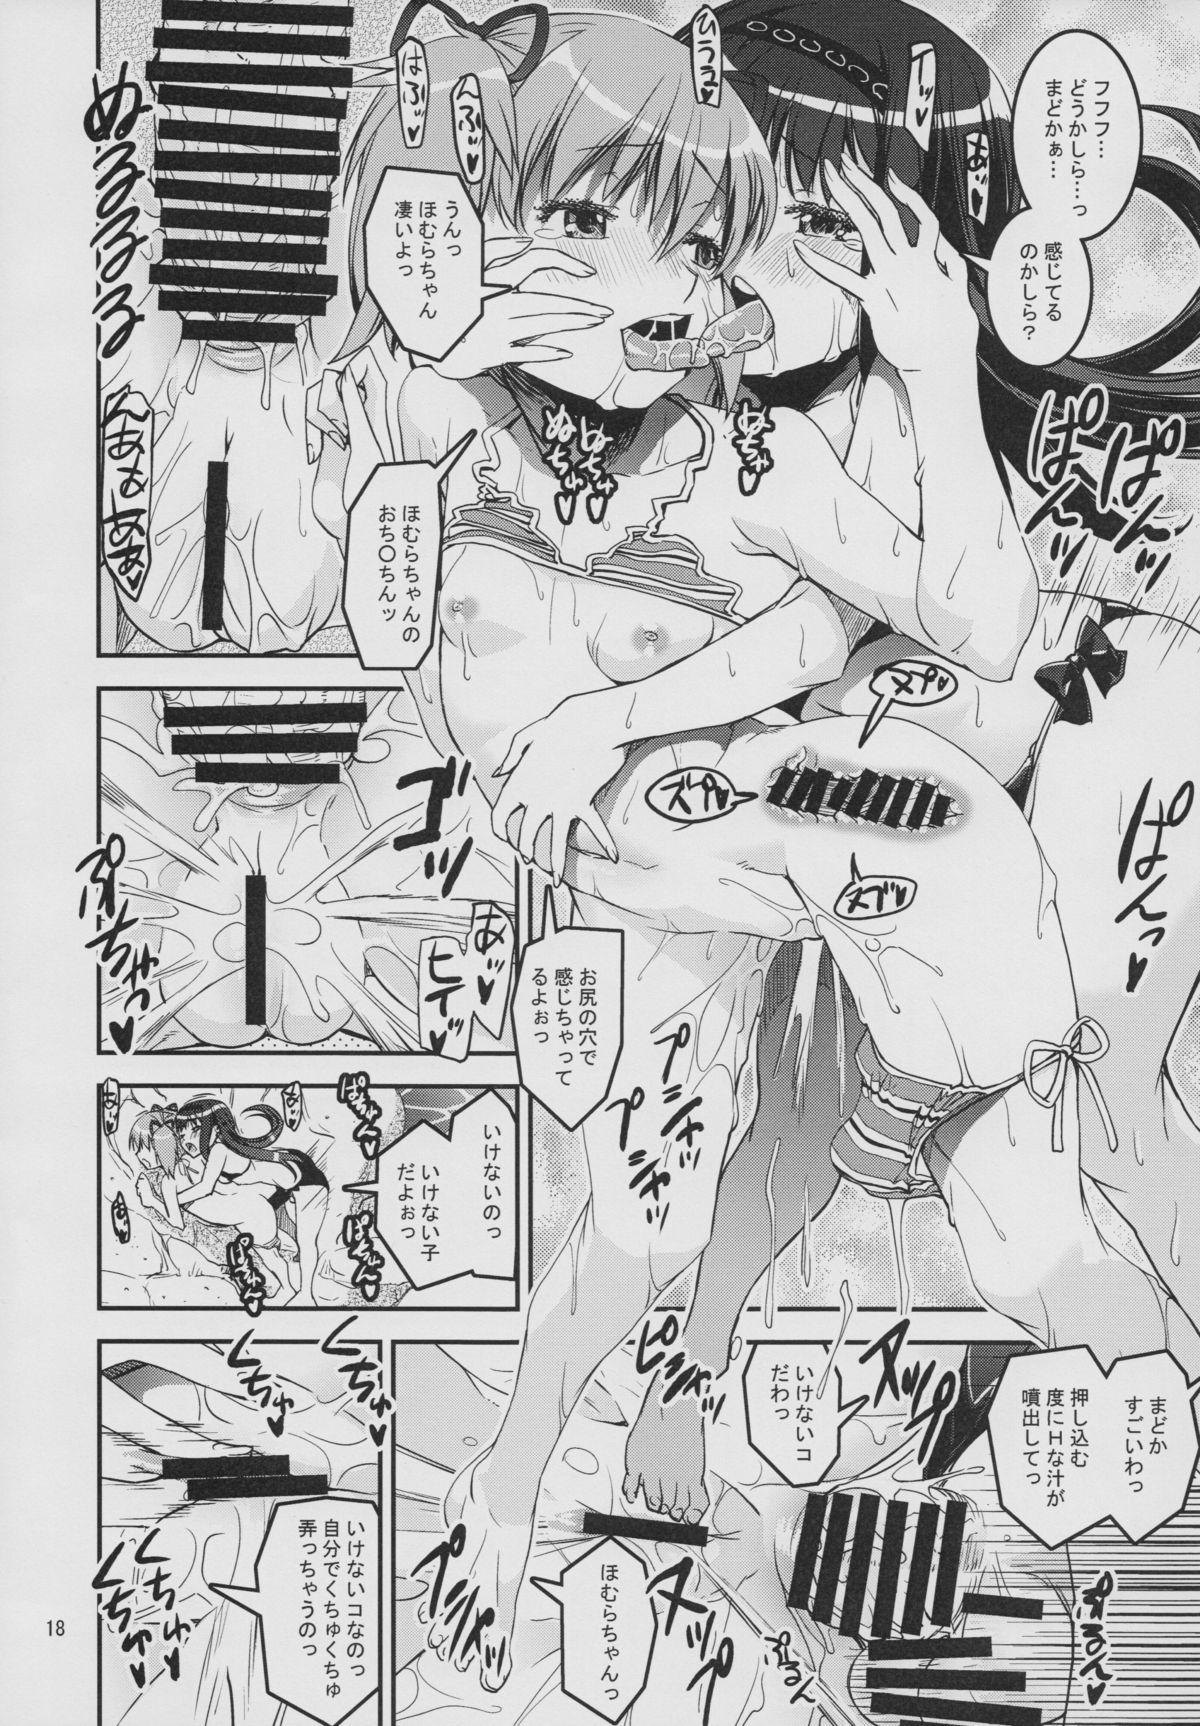 (C86) [KATAMARI-YA (Kanetsuki Masayoshi, Shinama) DevilAX (Puella Magi Madoka Magica) 17